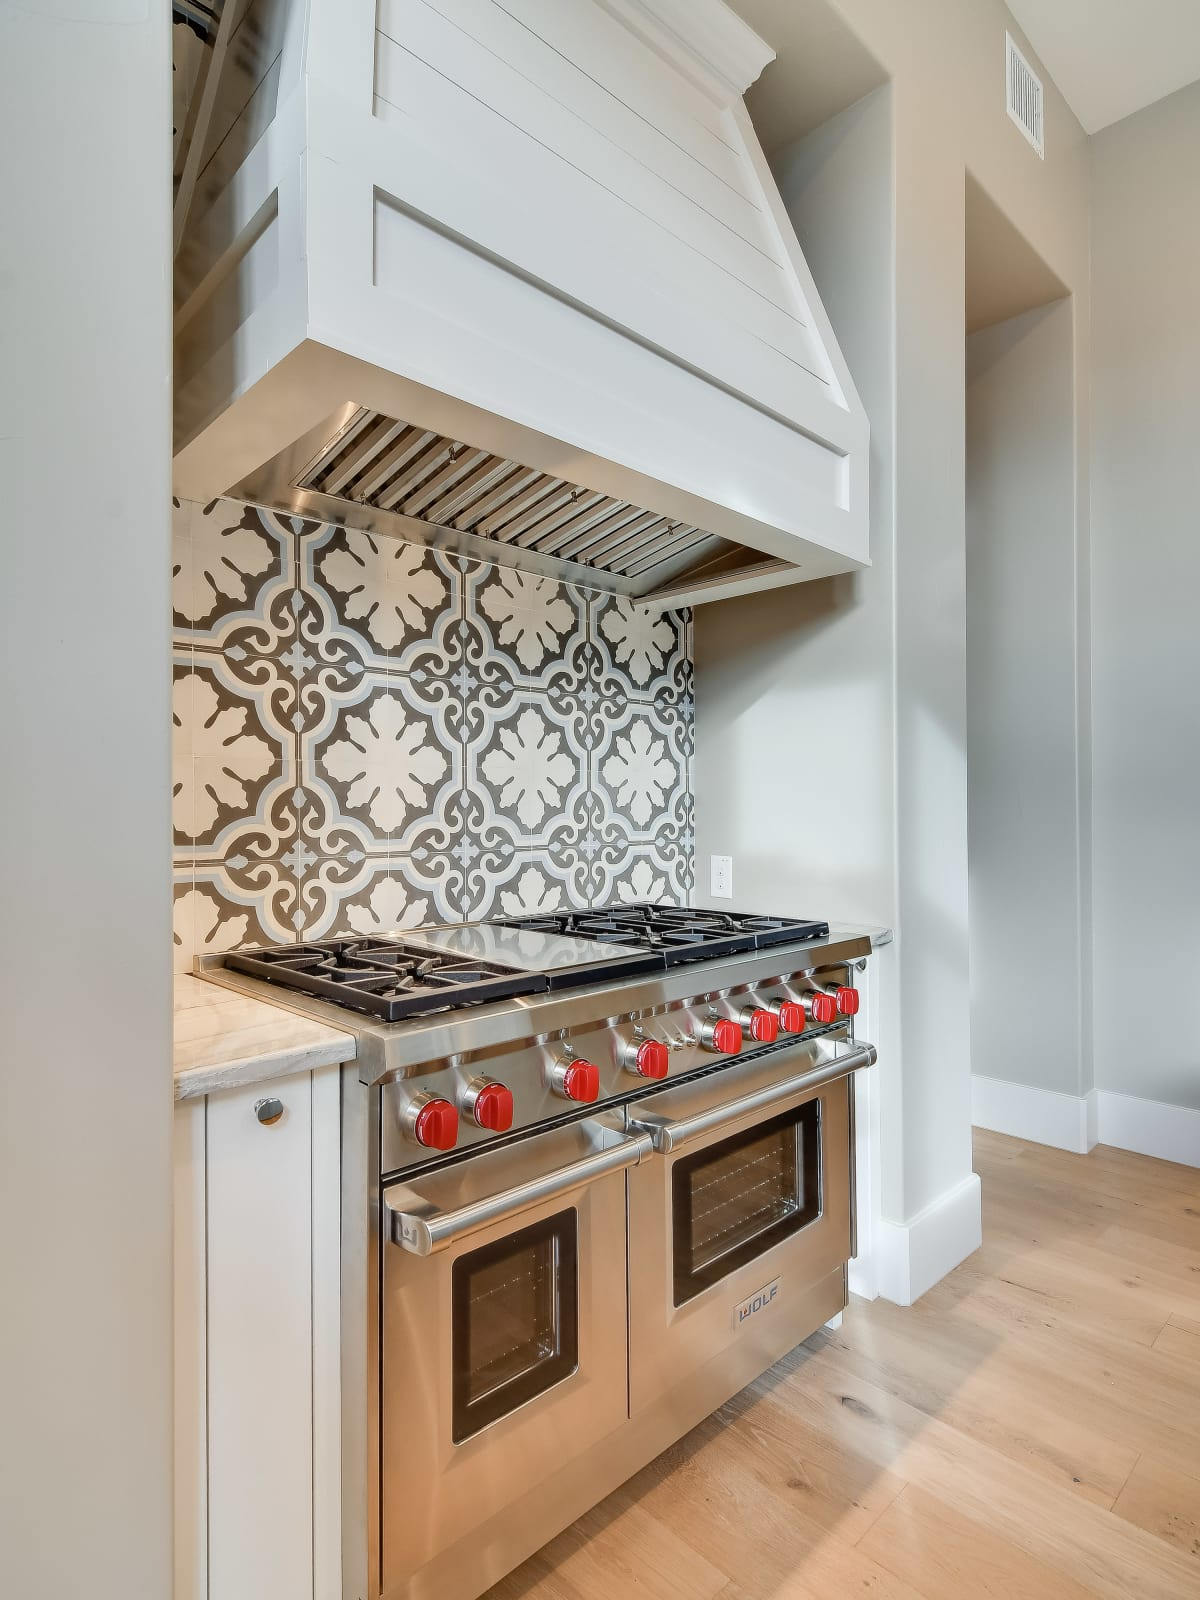 1016 Garraty, San Antonio, house, for sale kitchen